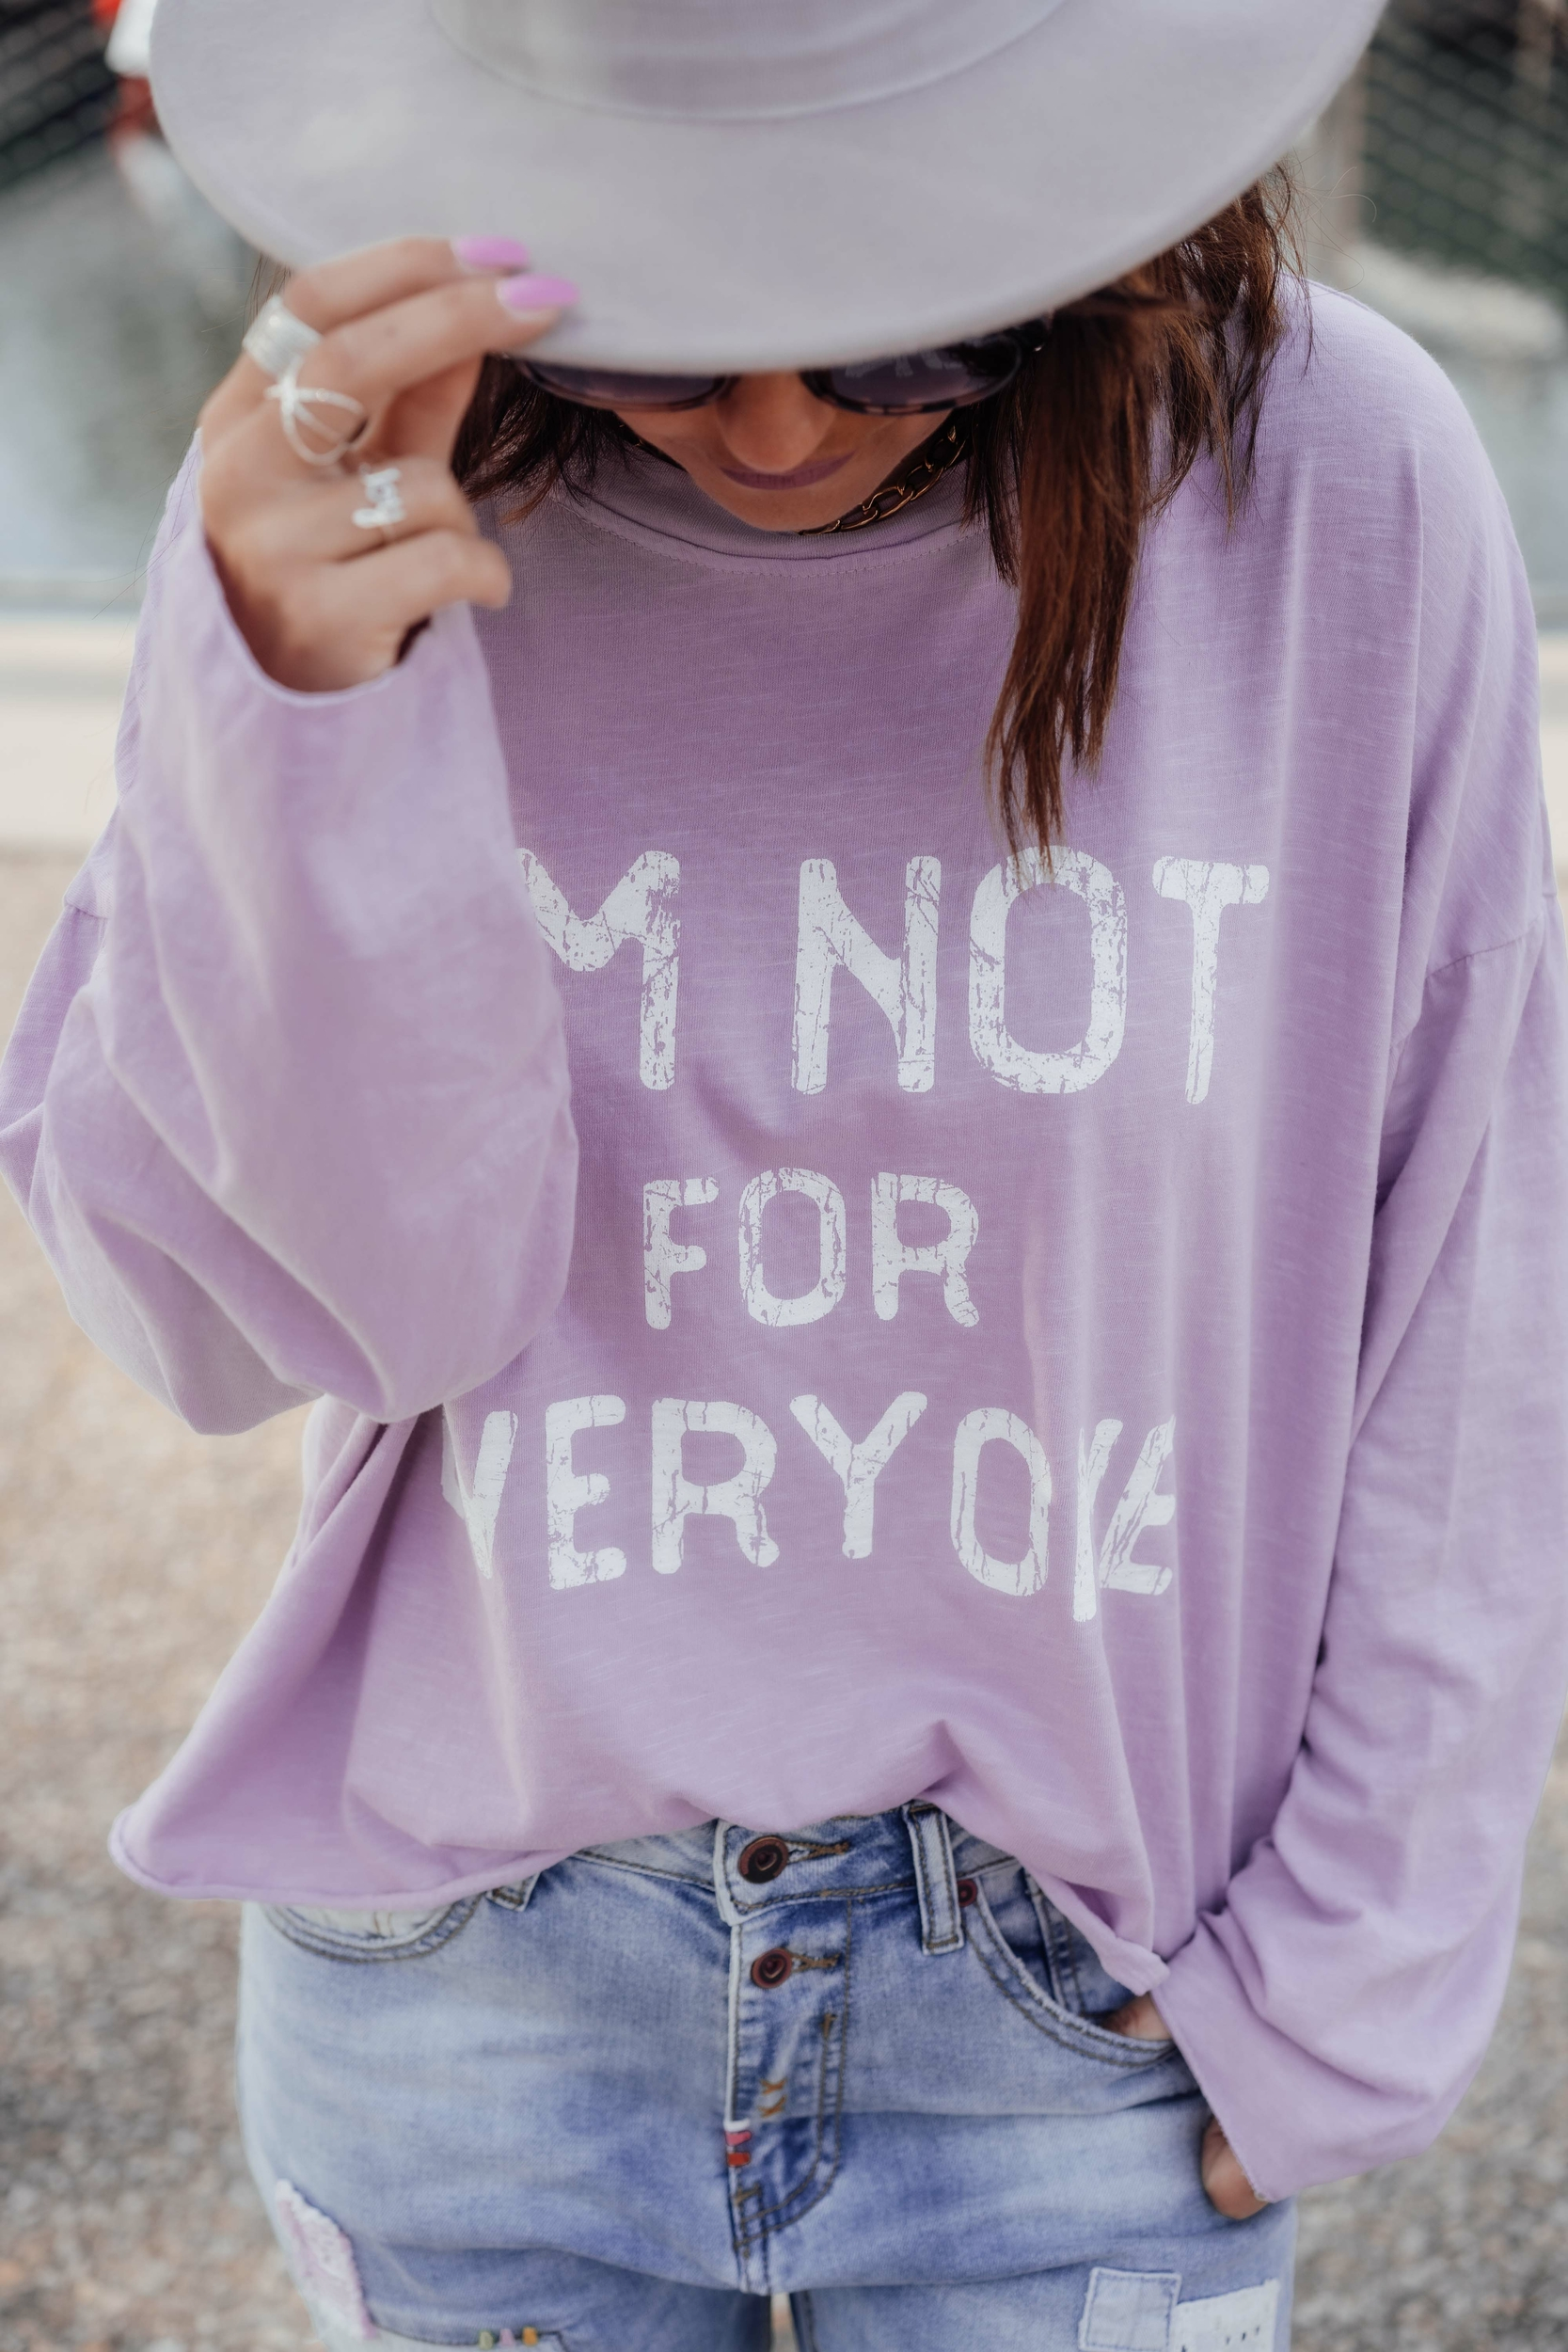 tee_i_m not_violet-4